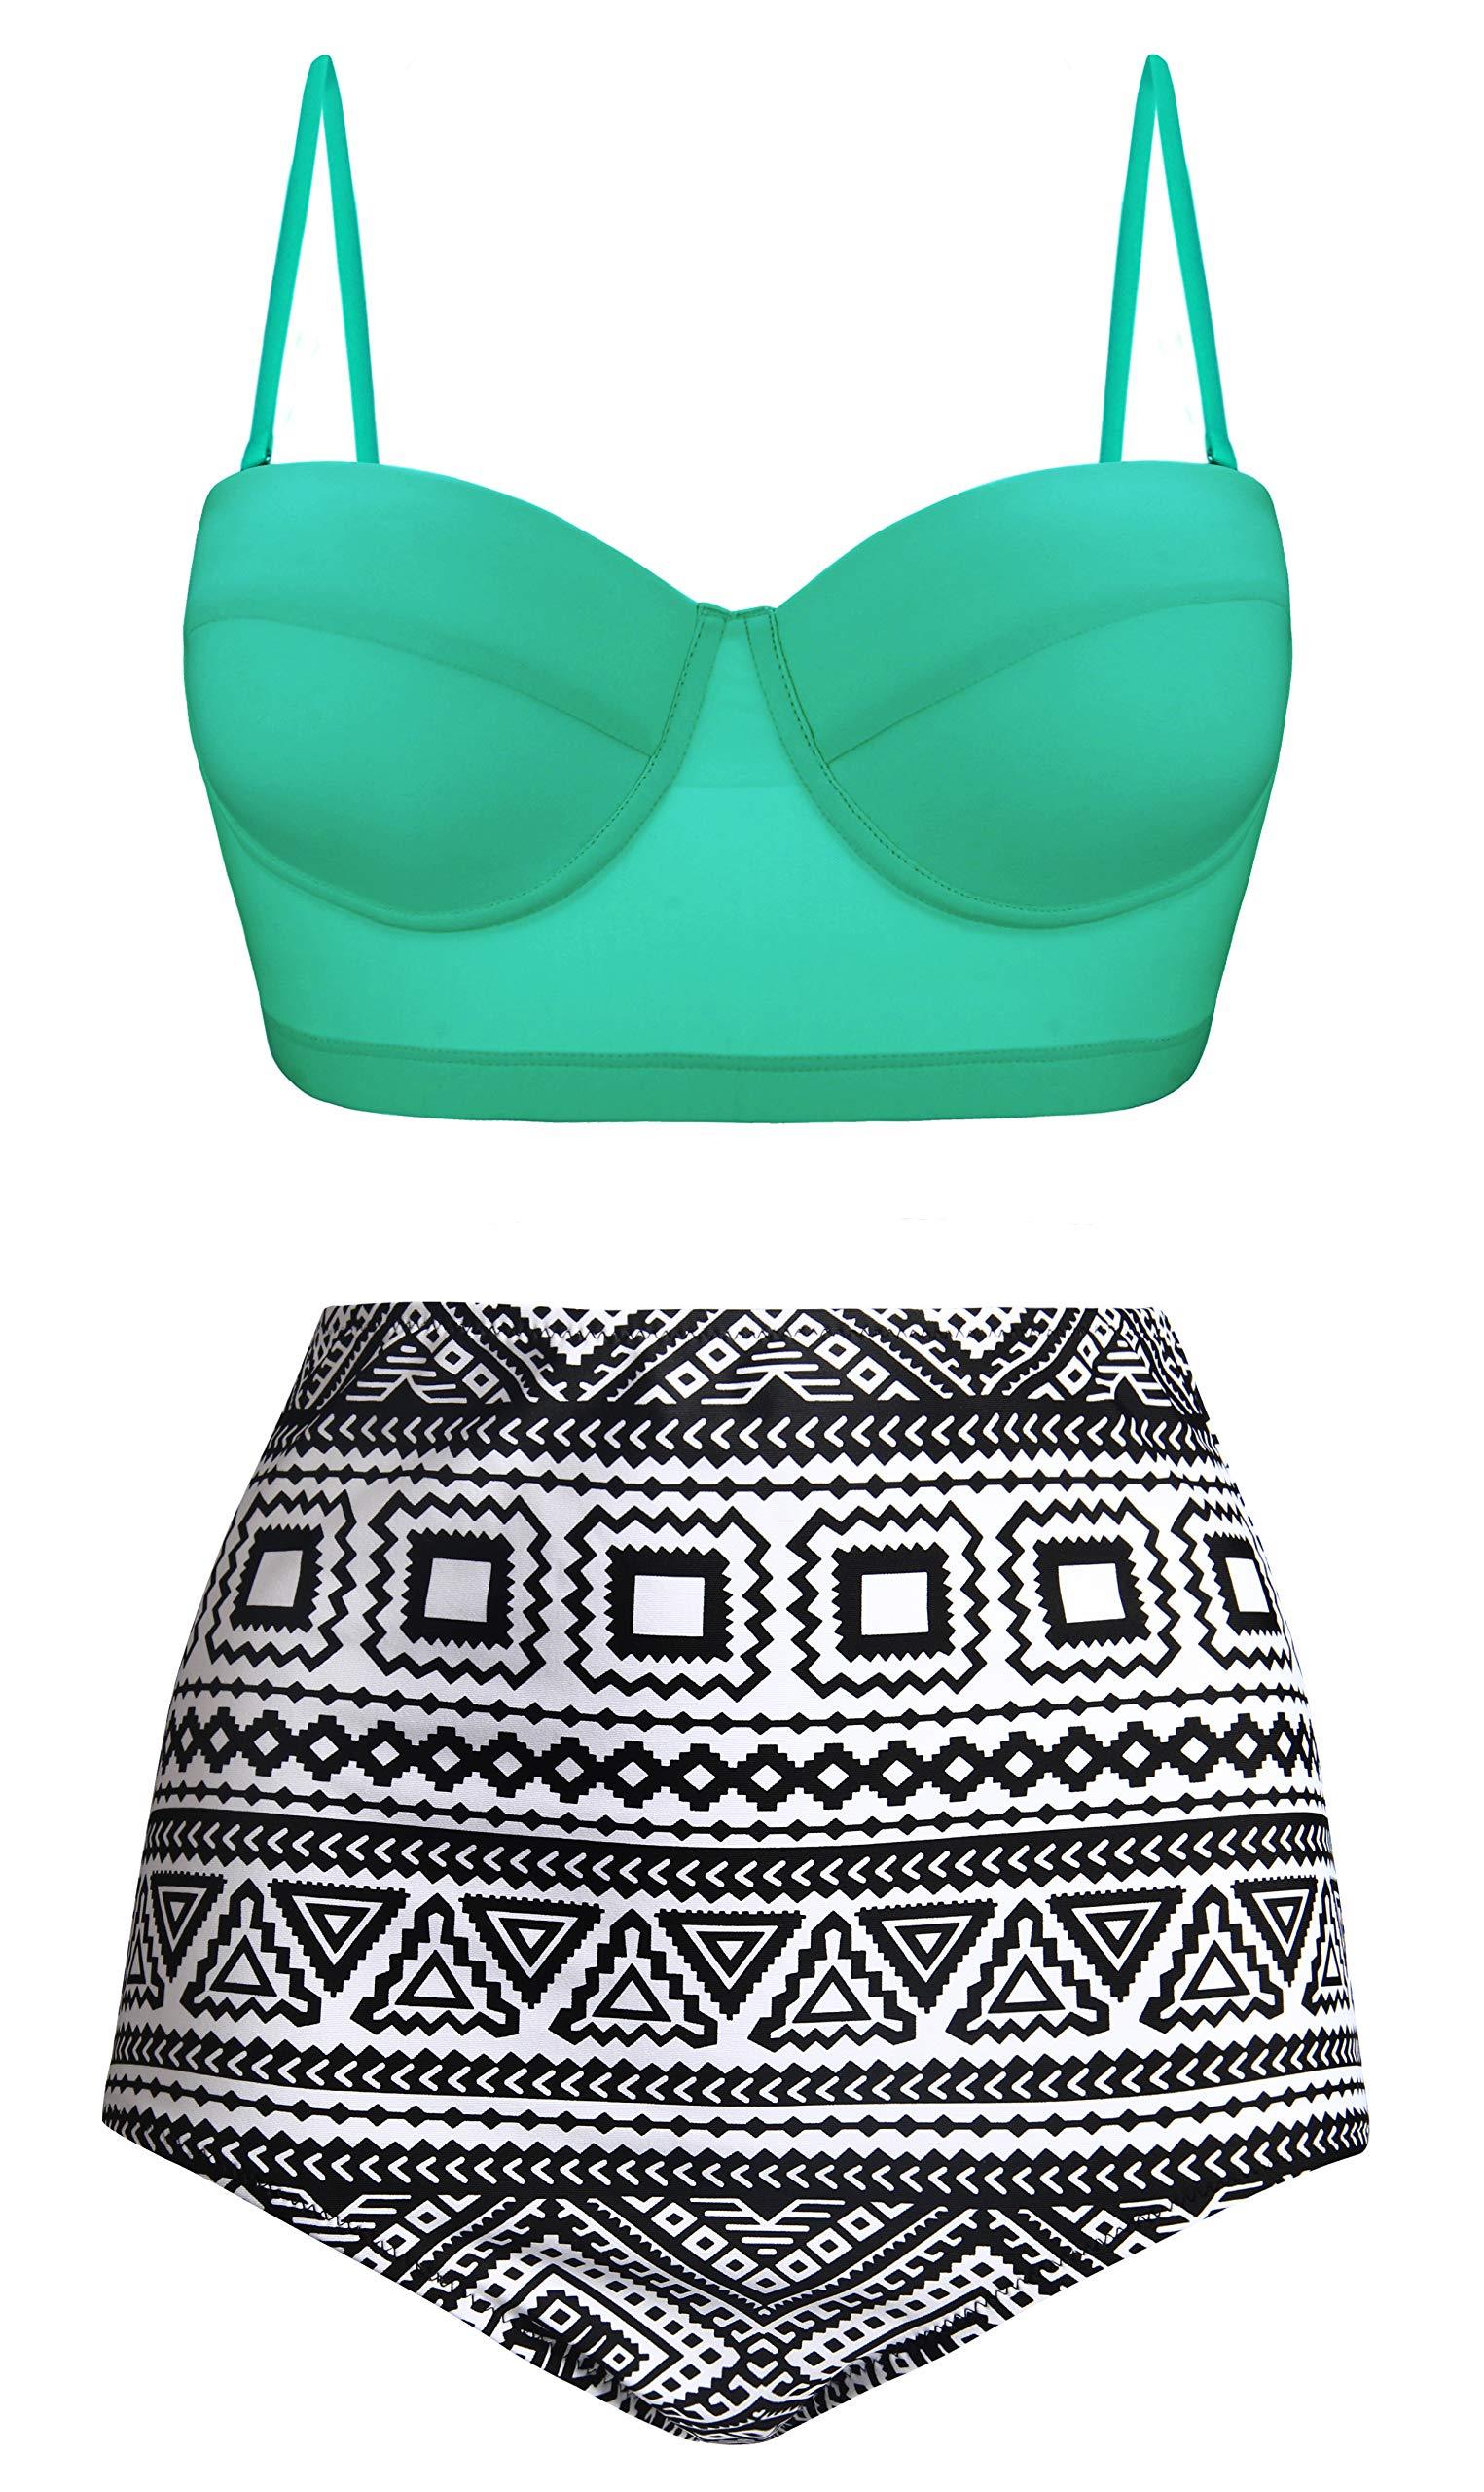 ff65b27eb54 Angerella Women Vintage Polka Dot High Waisted Bathing Suits Bikini Set